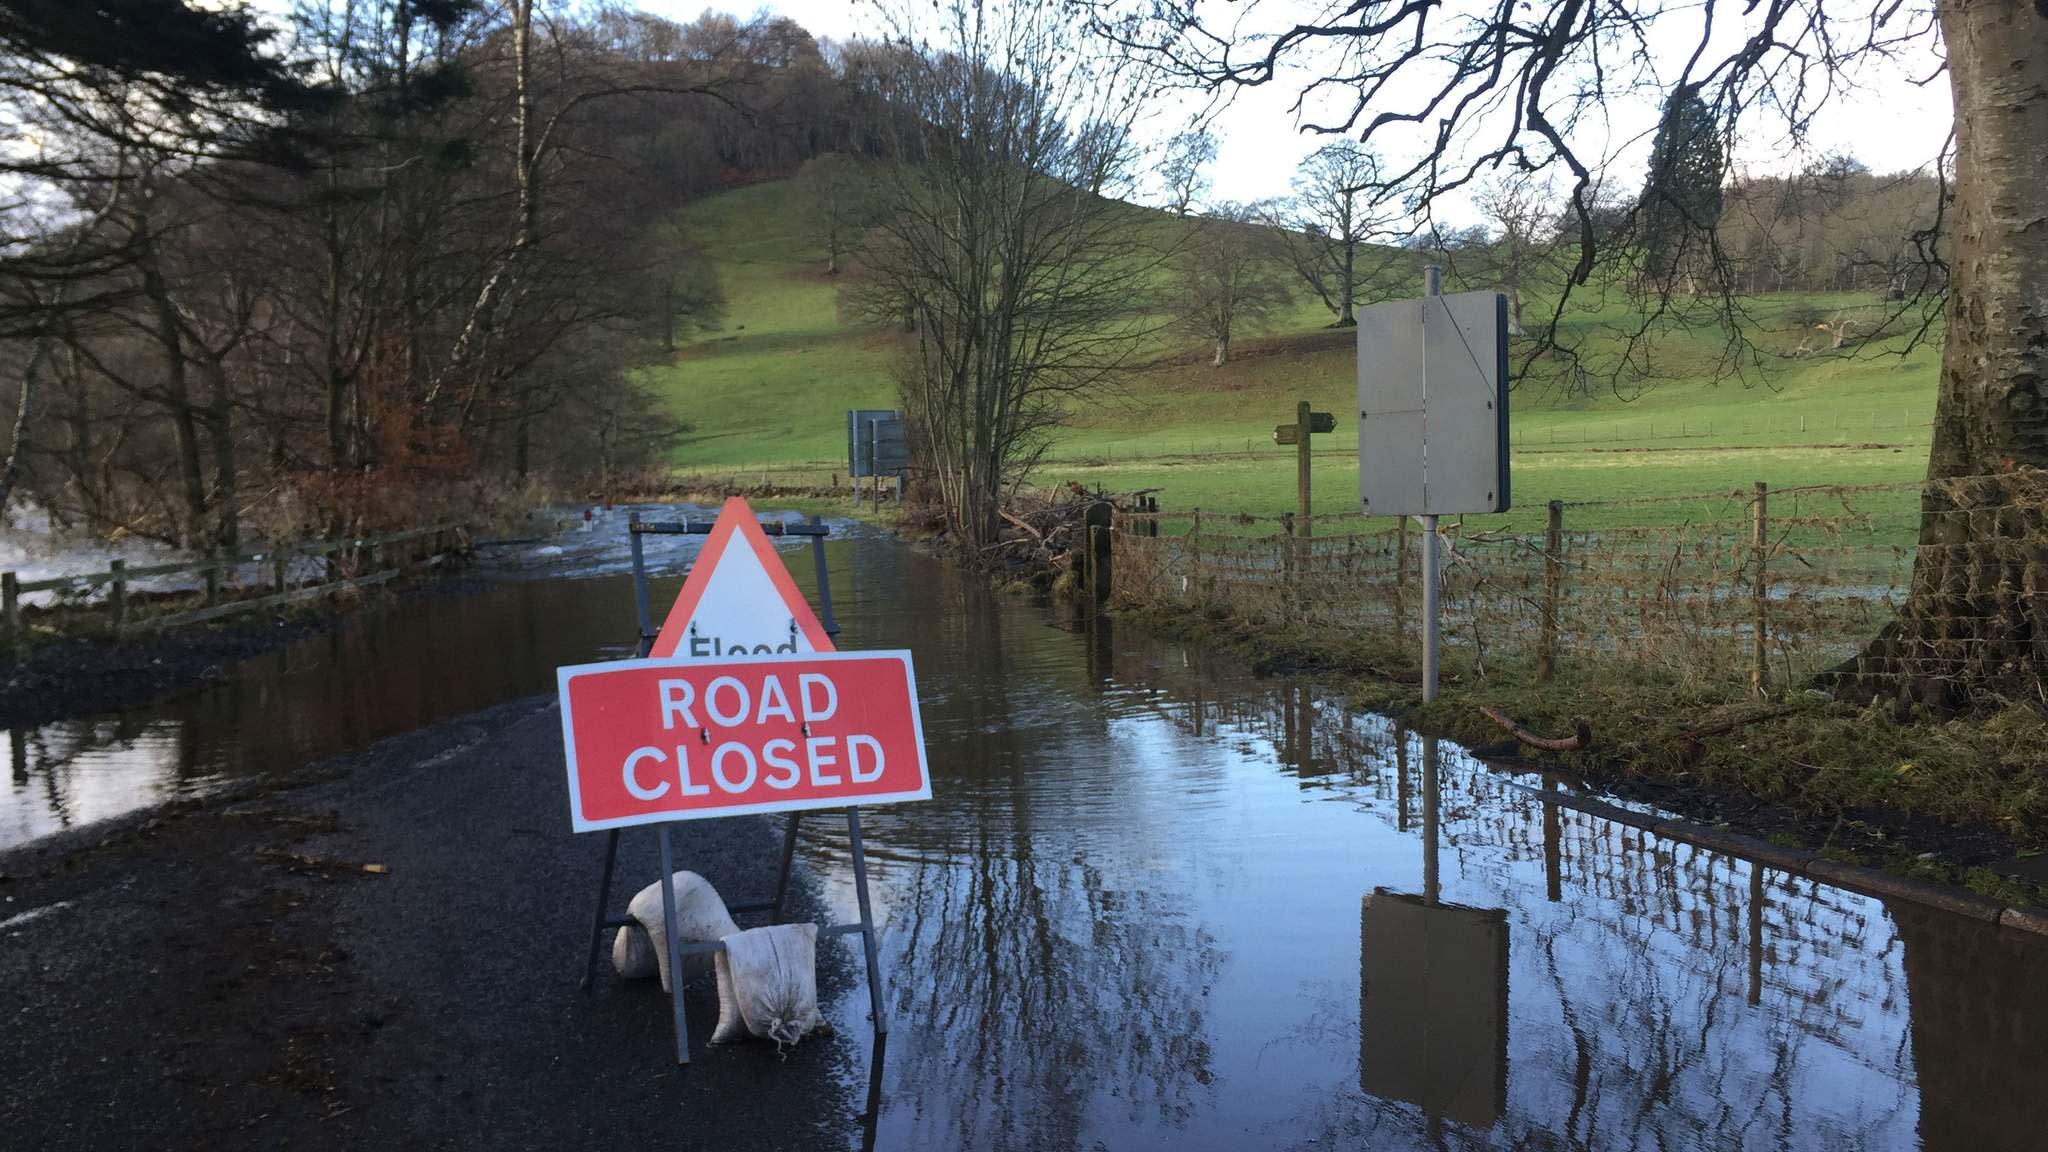 cumbria flood bride battles - HD1500×1062